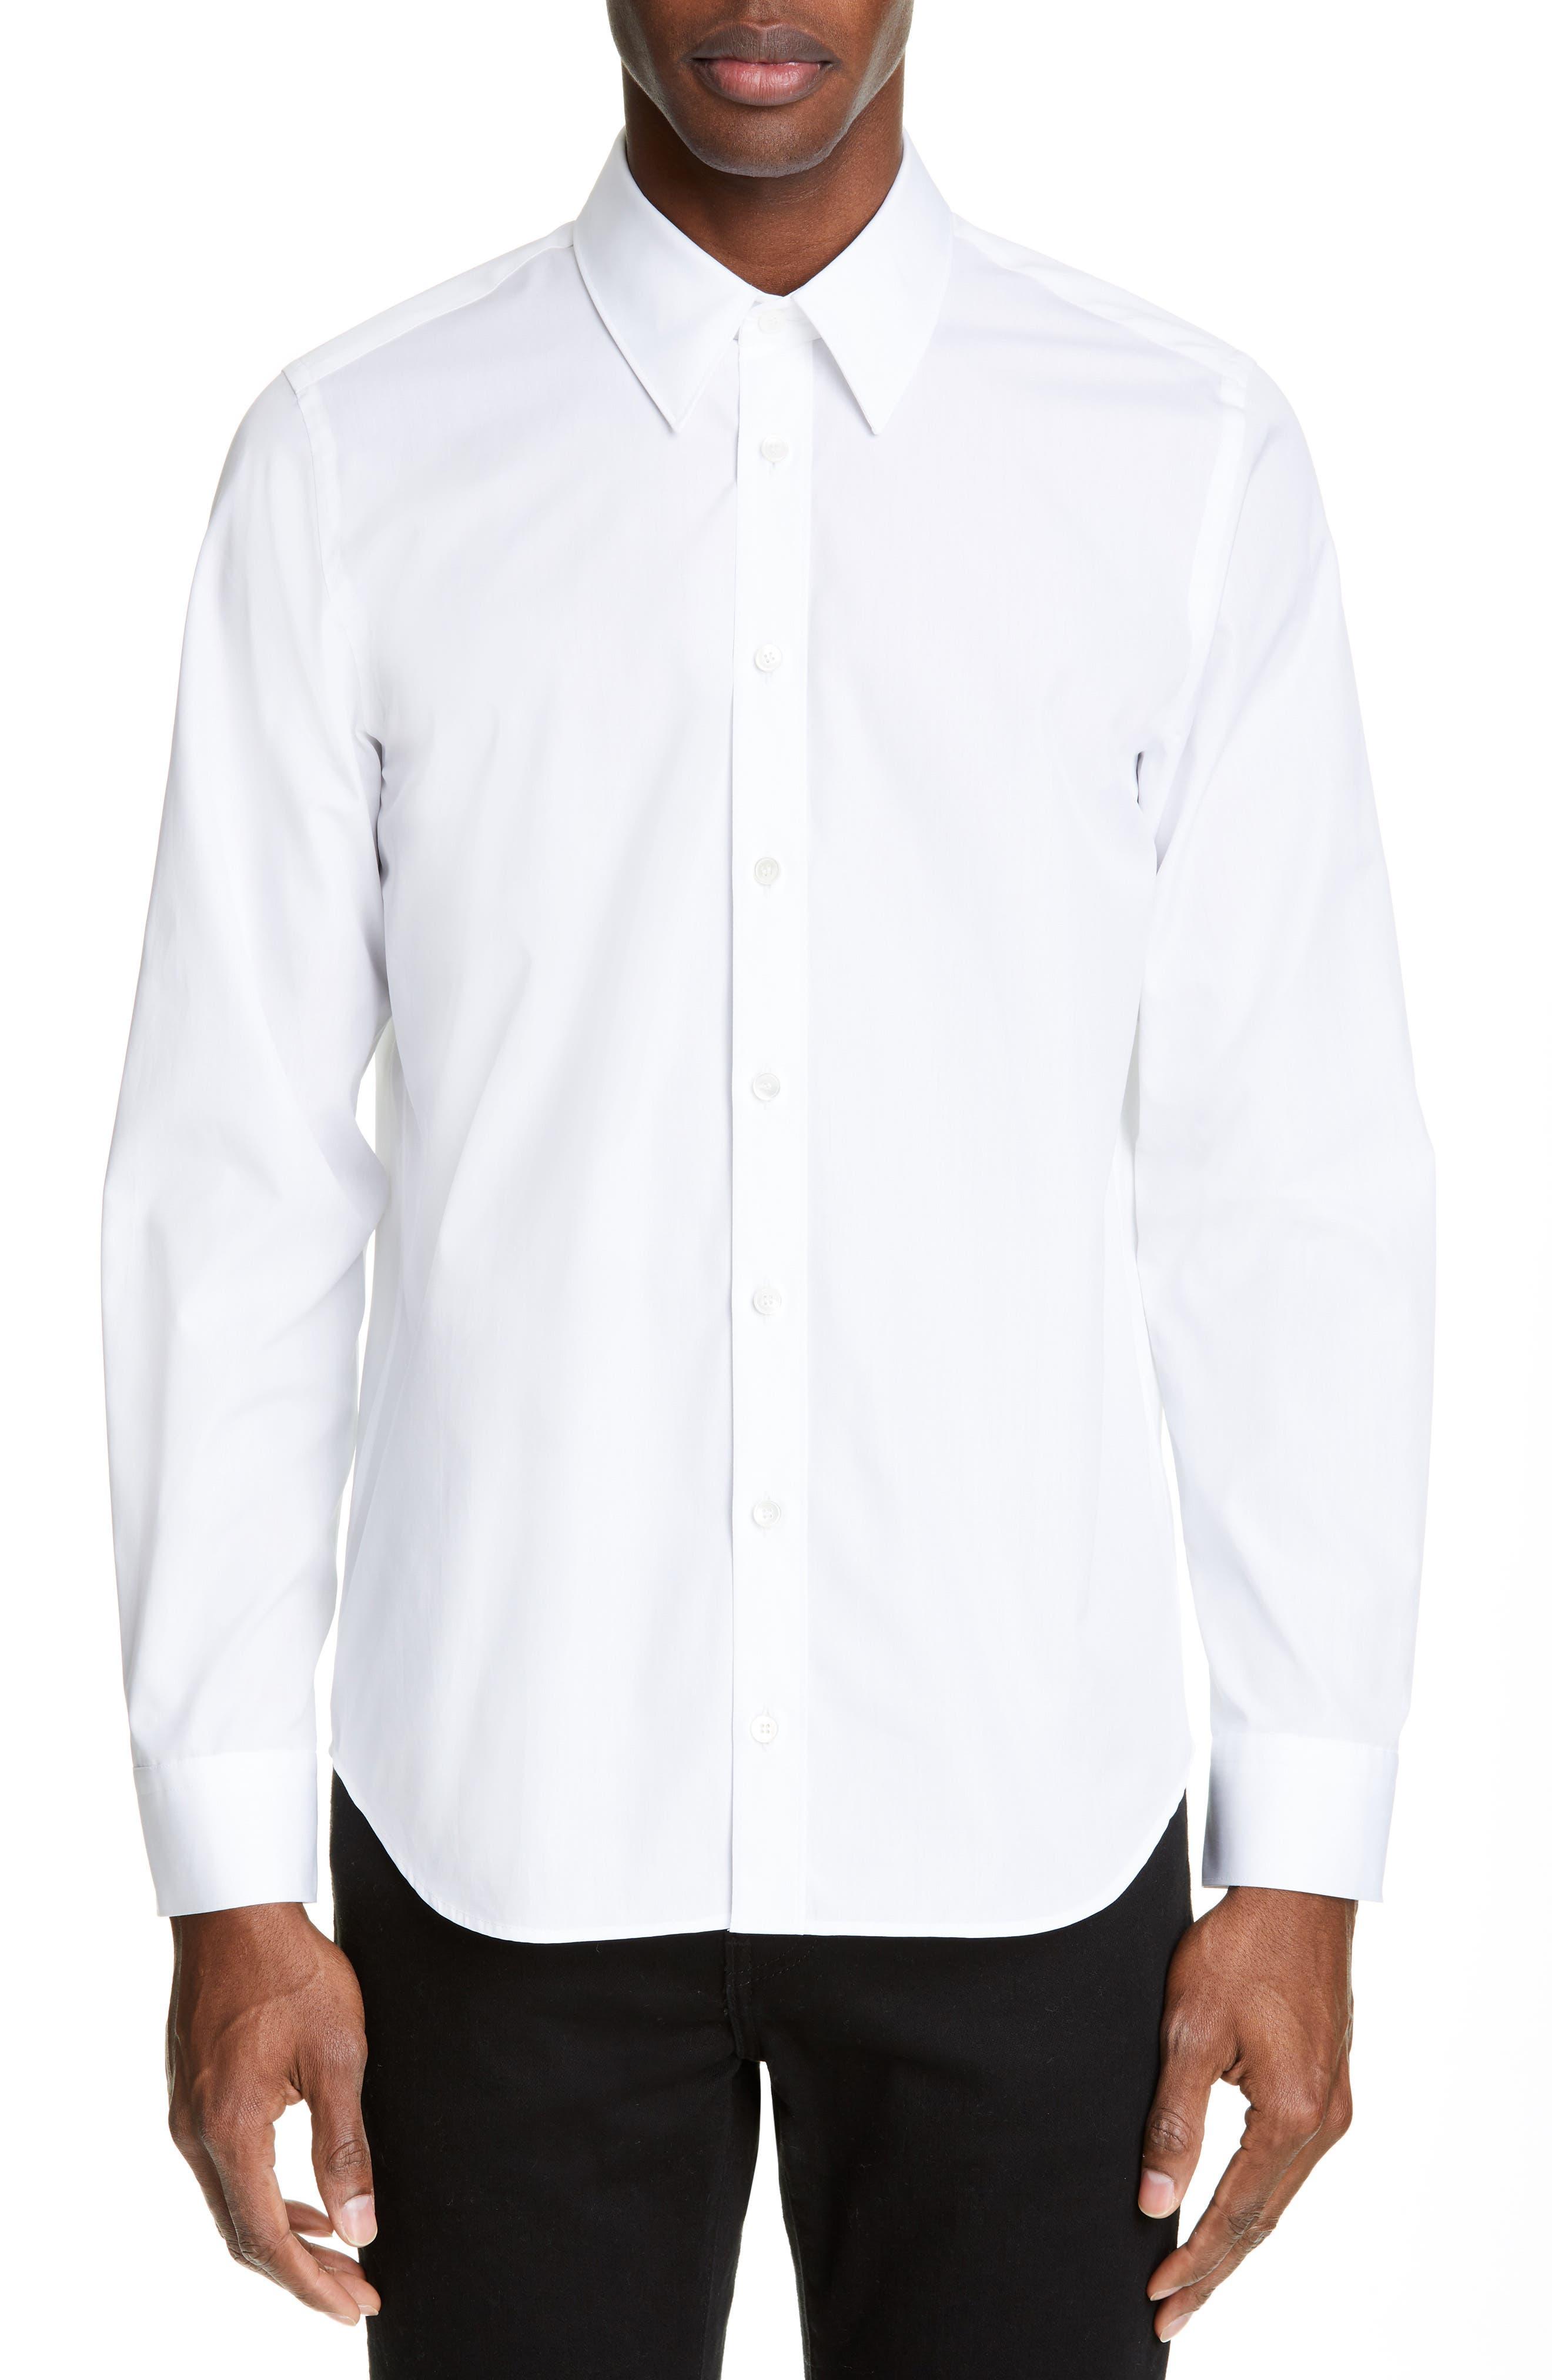 HELMUT LANG Logo Print Dress Shirt, Main, color, WHITE/SILVER